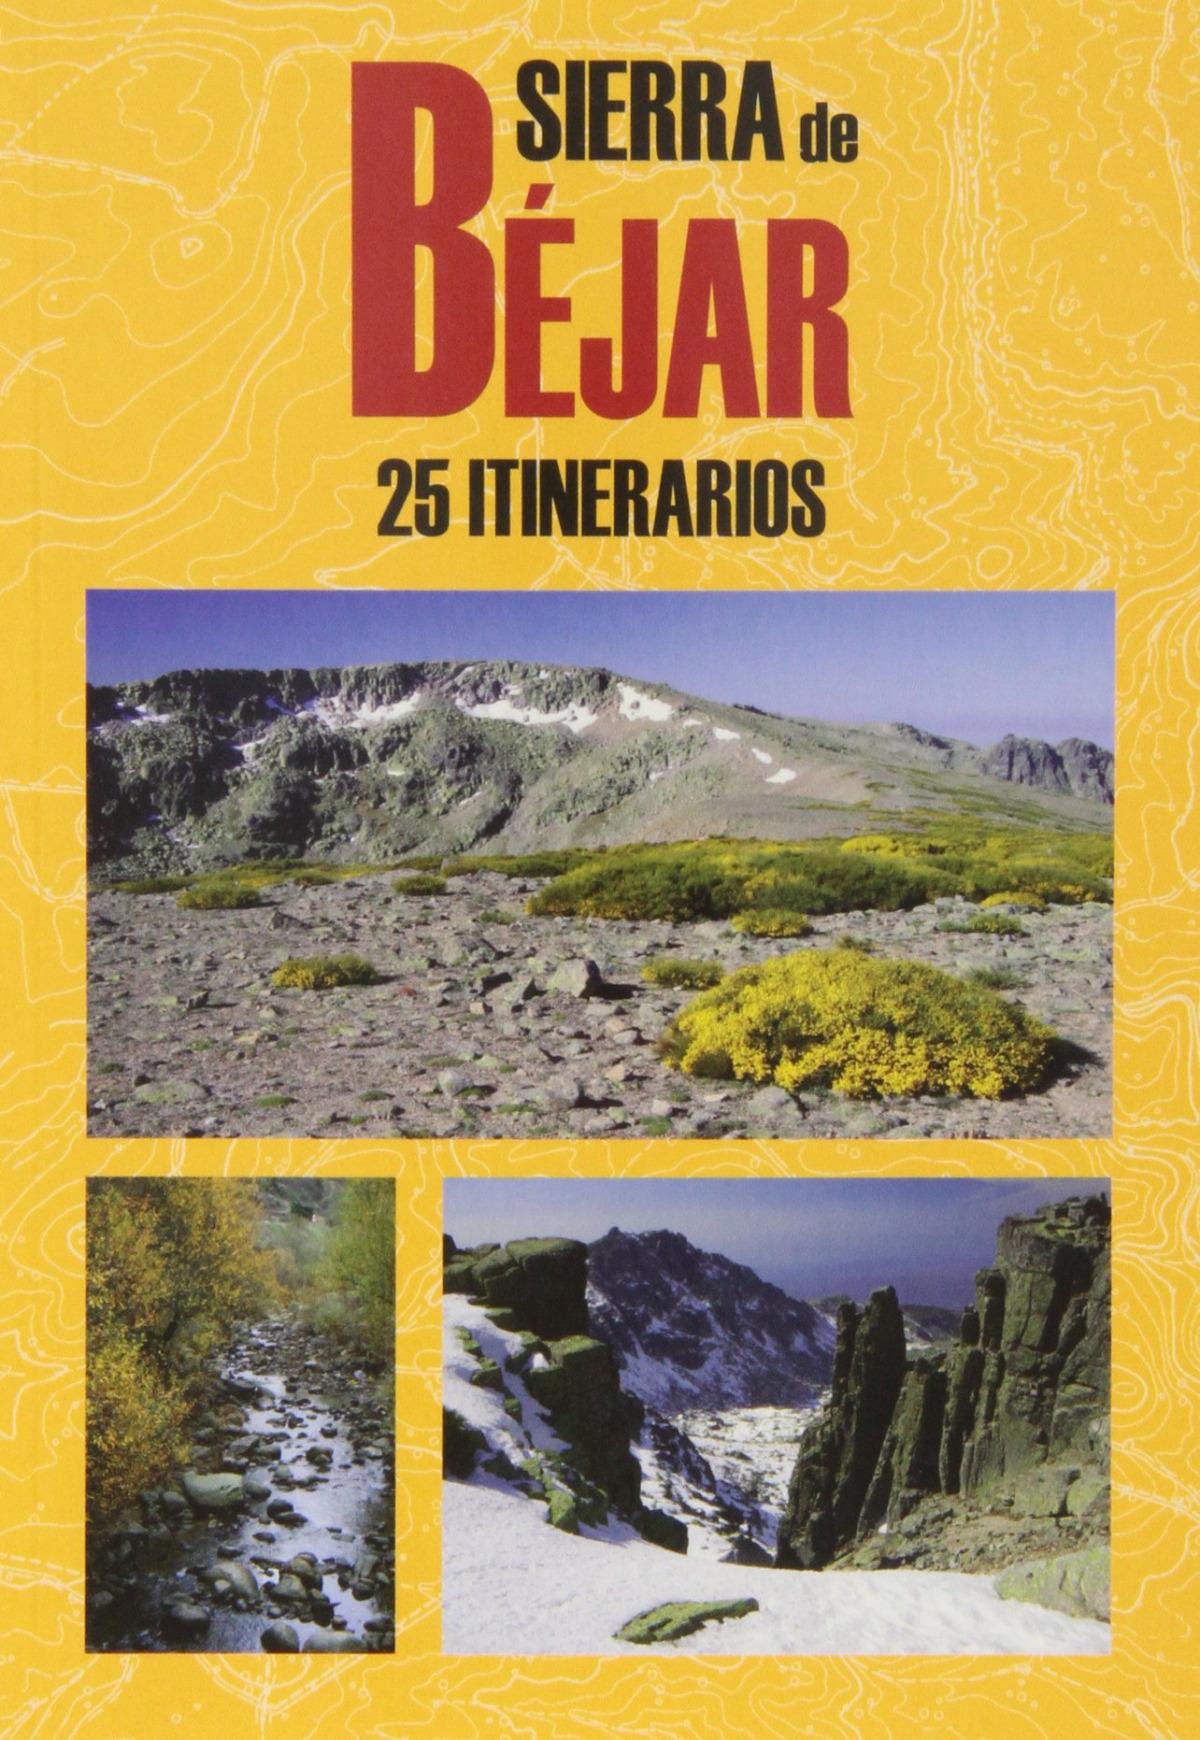 Sierra de Bejar 9788495368683